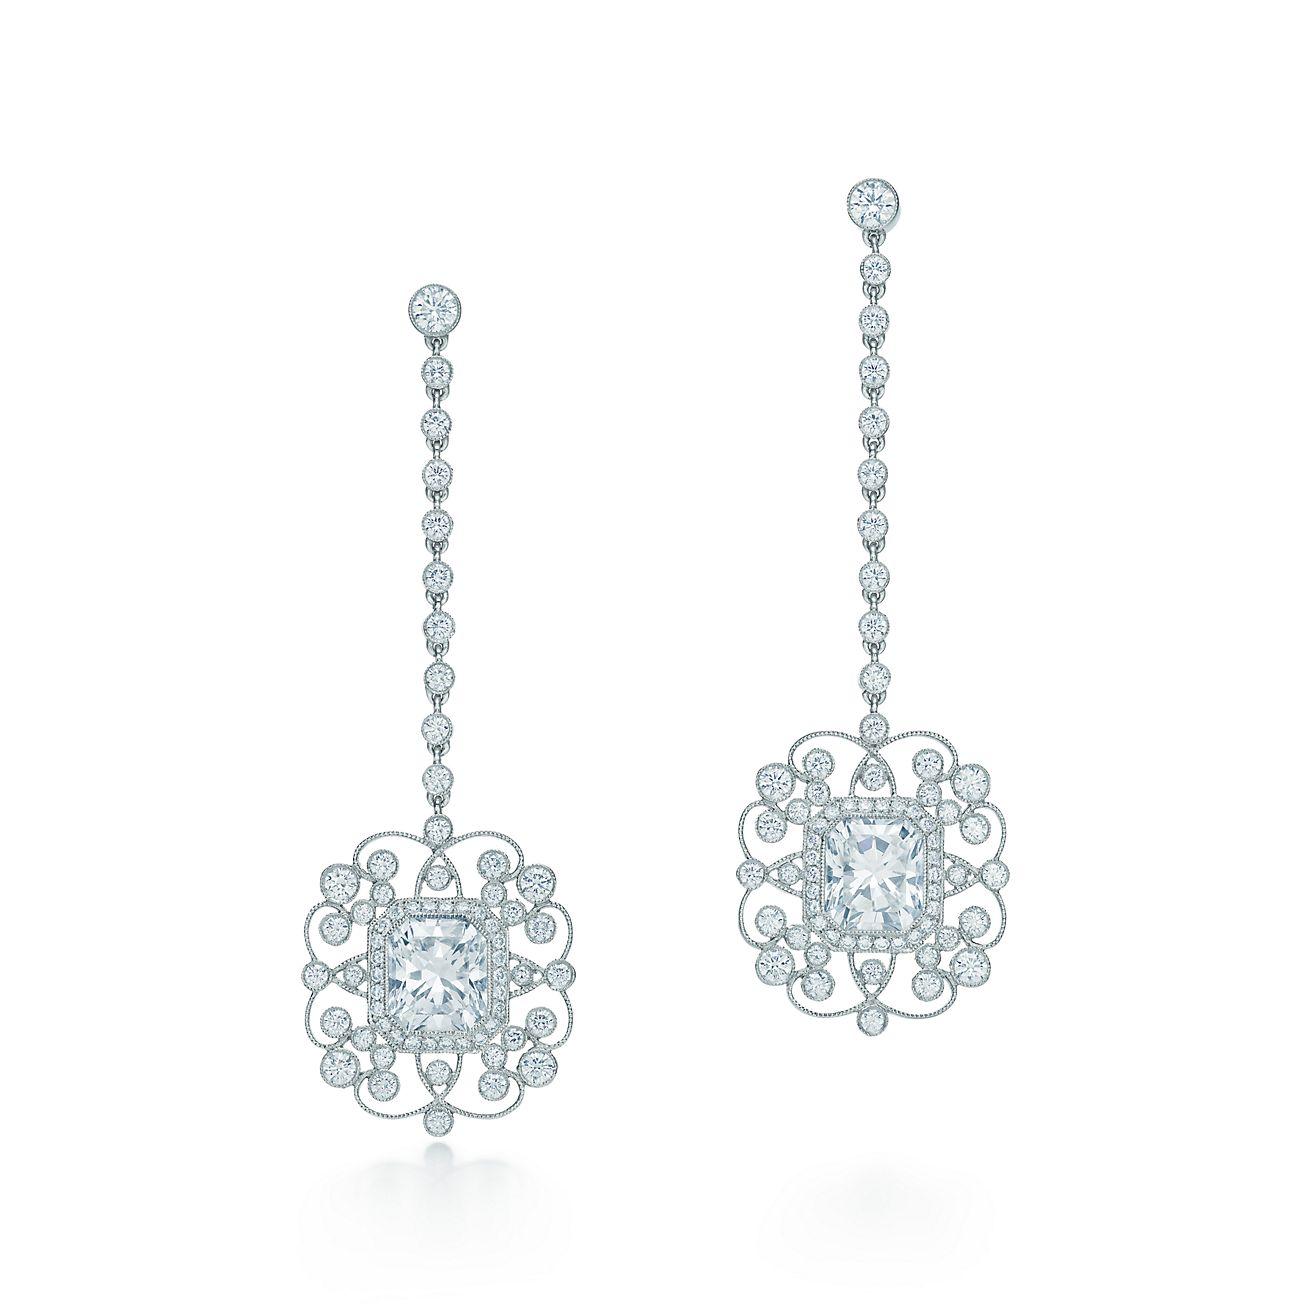 tiffany and co diamond drop earrings